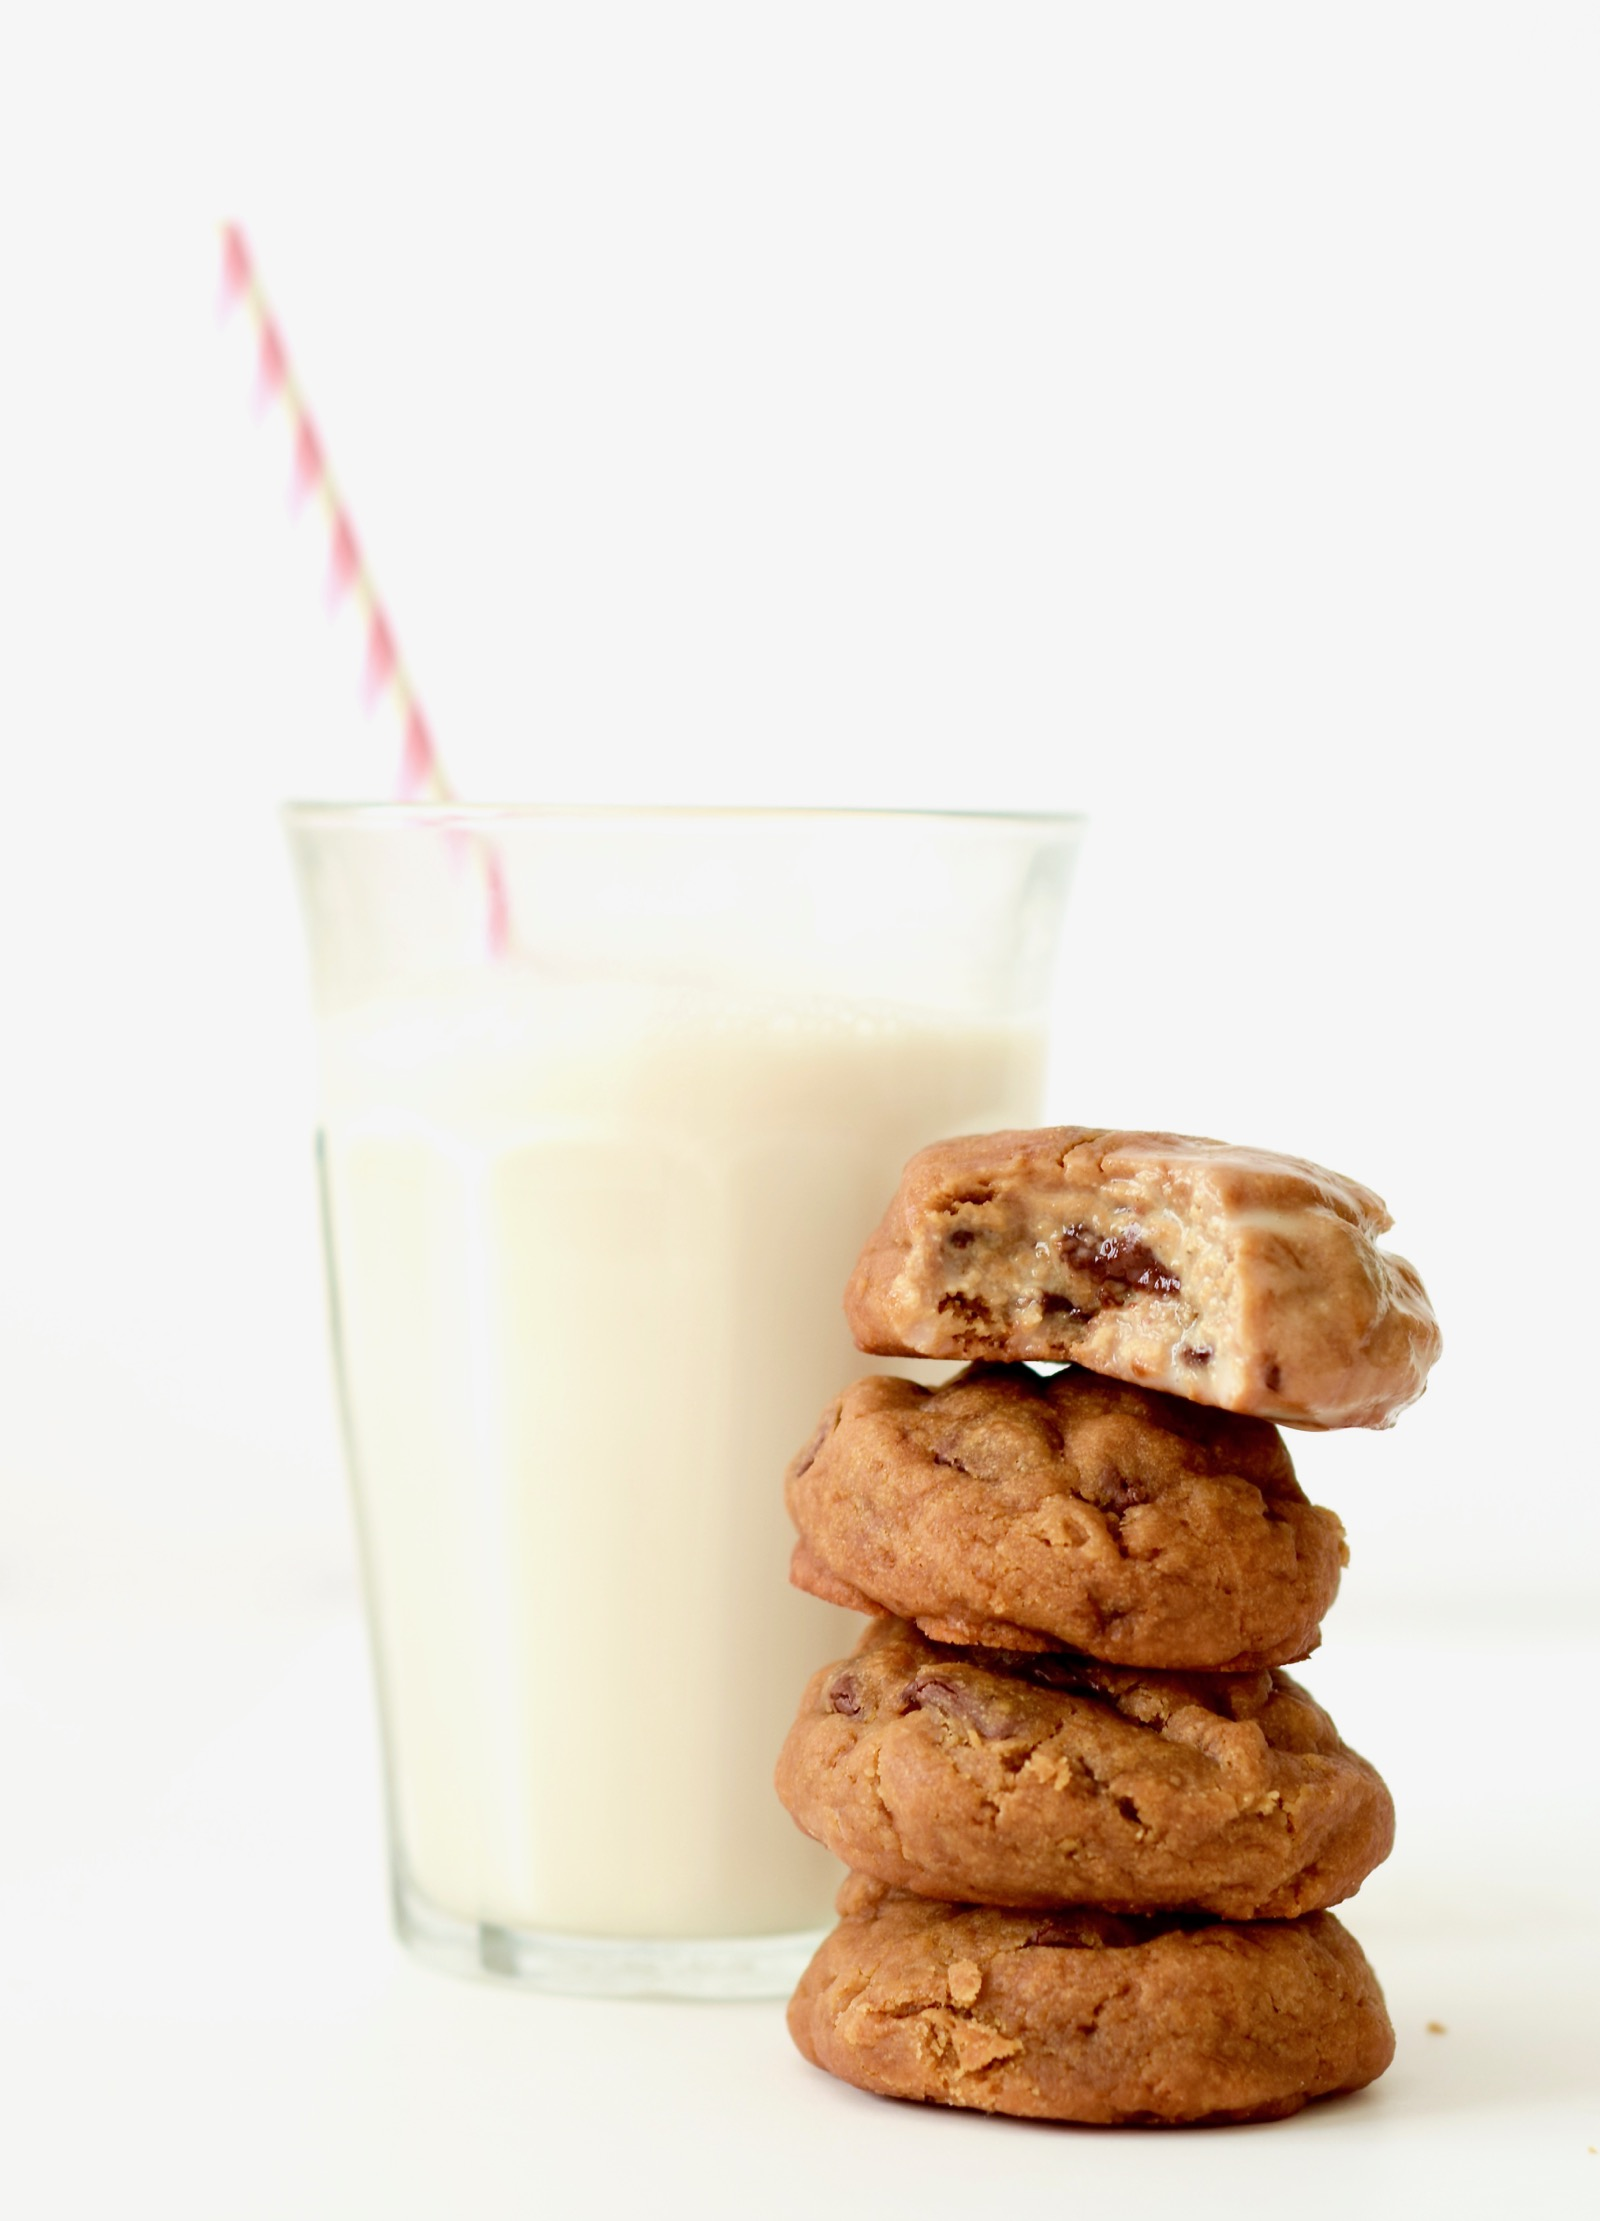 Vegan Chocolate Chip Cookies Recipe Dairy-Free